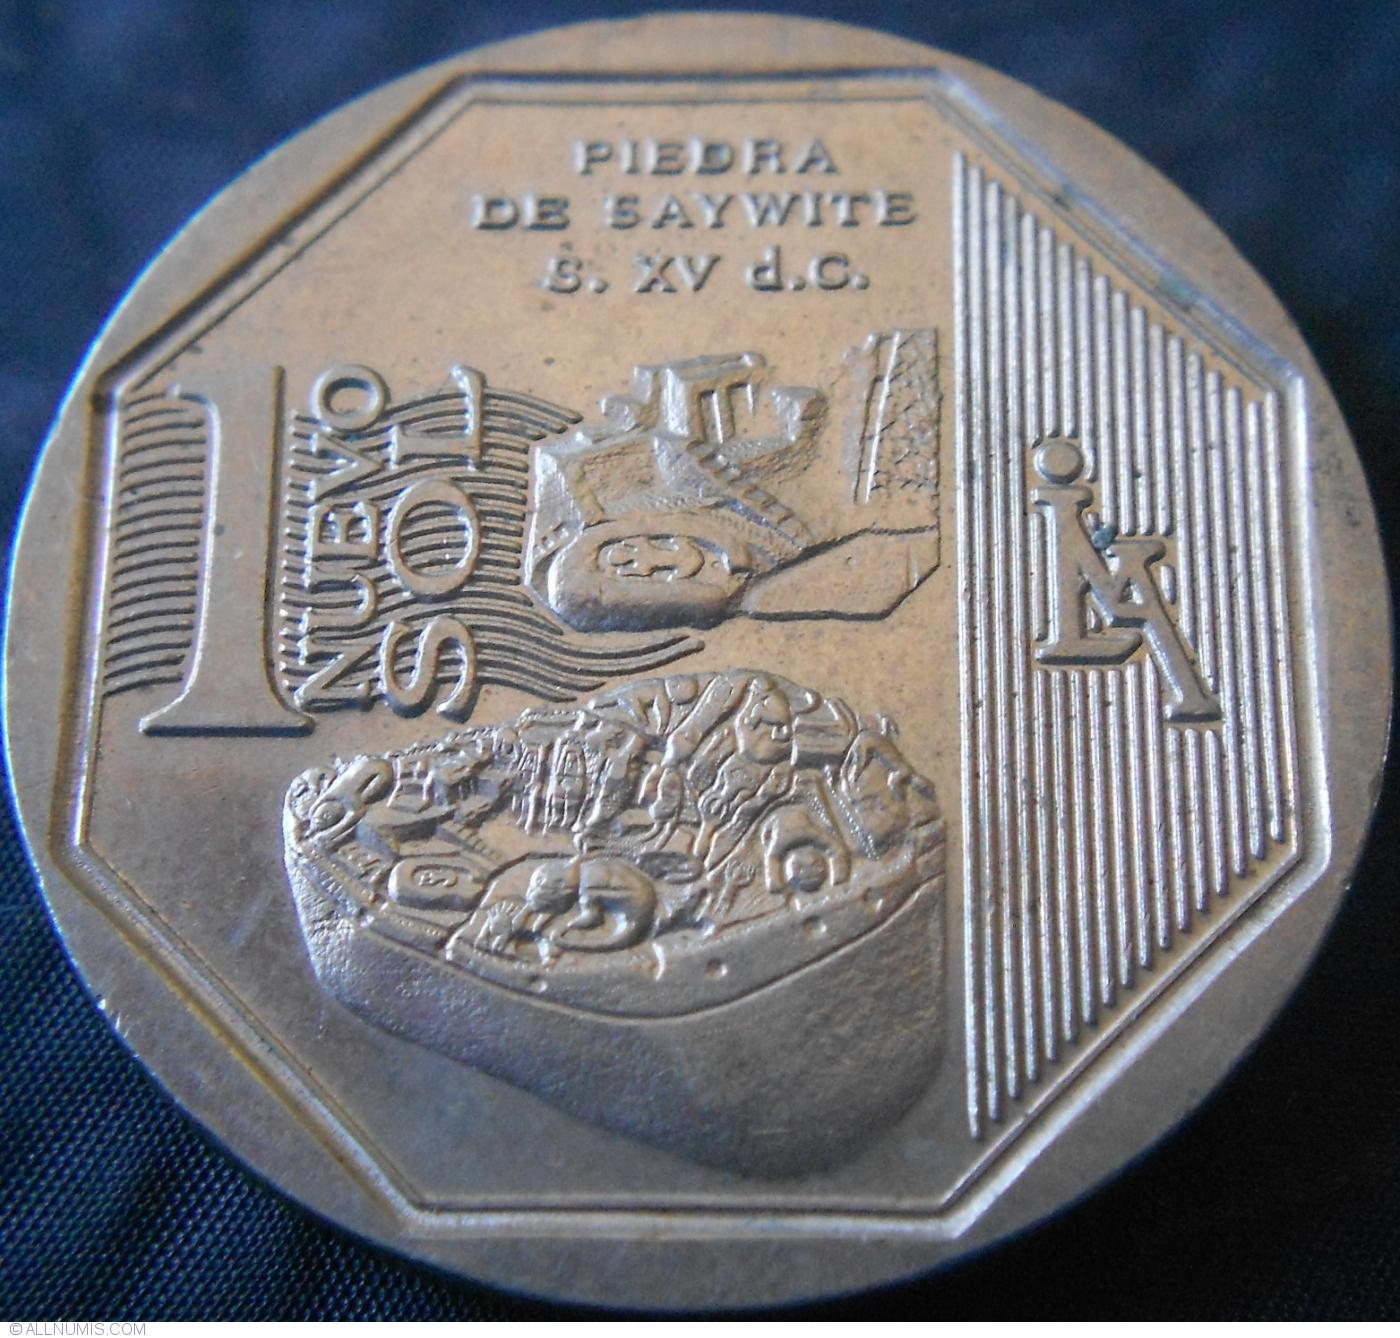 Bonus 1925 $1 Silver Peace Dollar MS 62 PCGS Certified 7365.62-8127601 Rattler